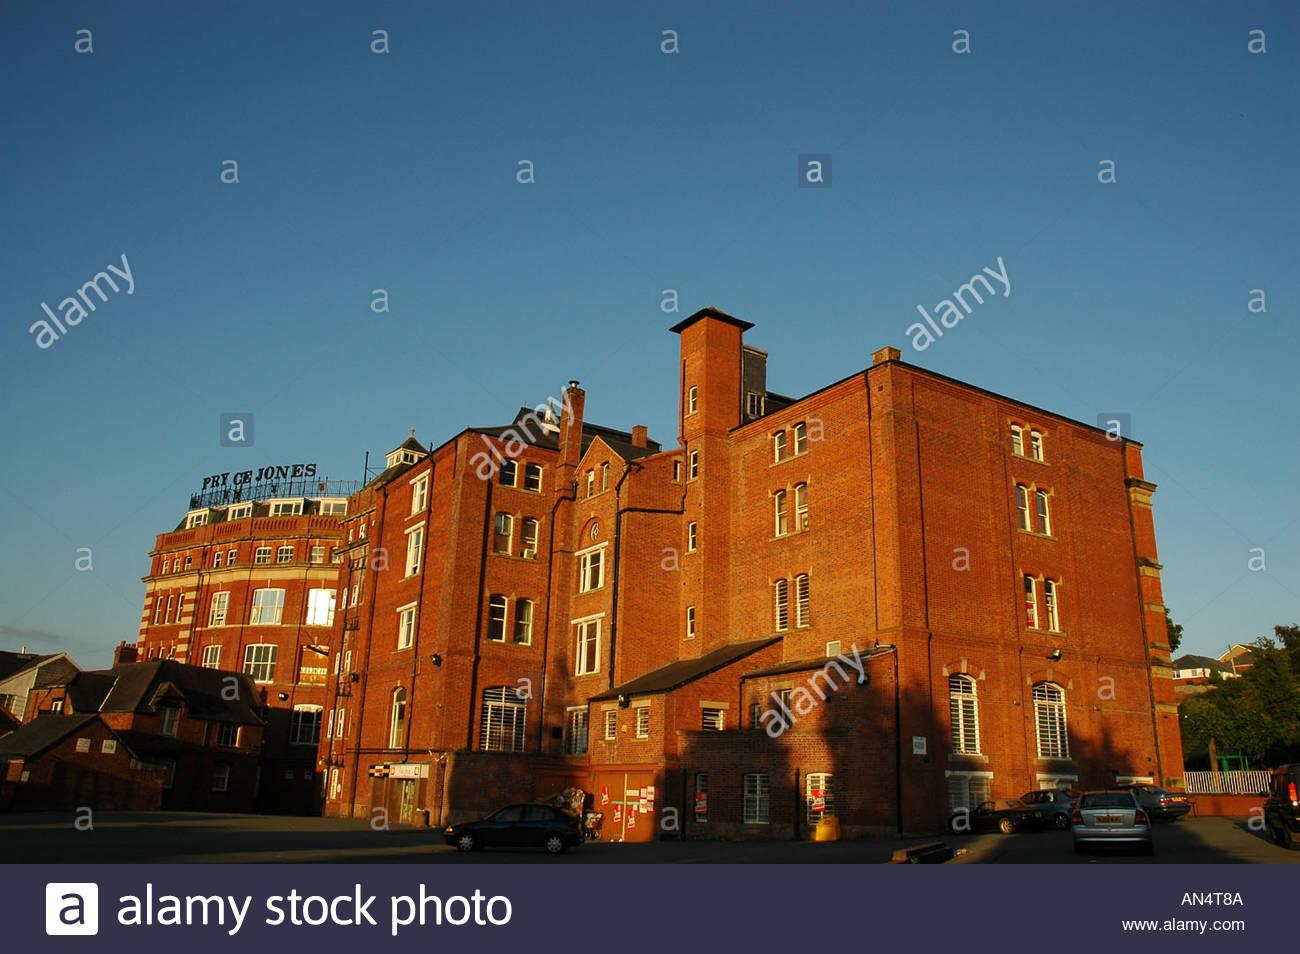 pryce-jones-royal-welsh-warehouse-newtown-mid-wales-AN4T8A.jpg